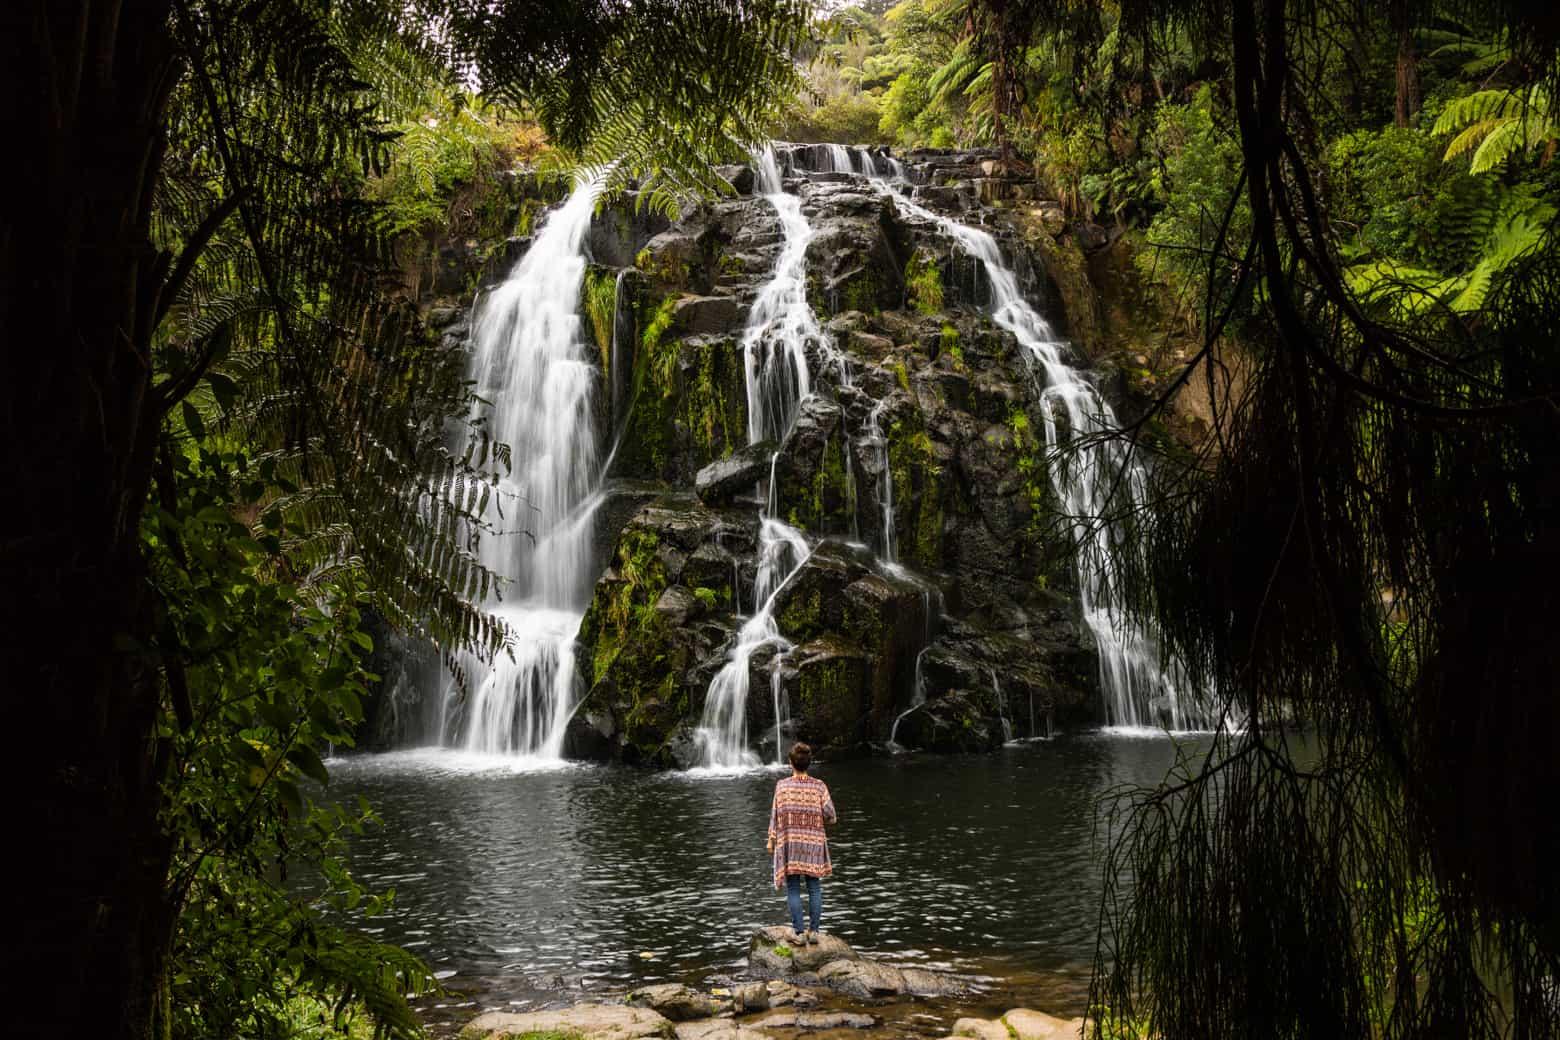 Ohwaroa falls